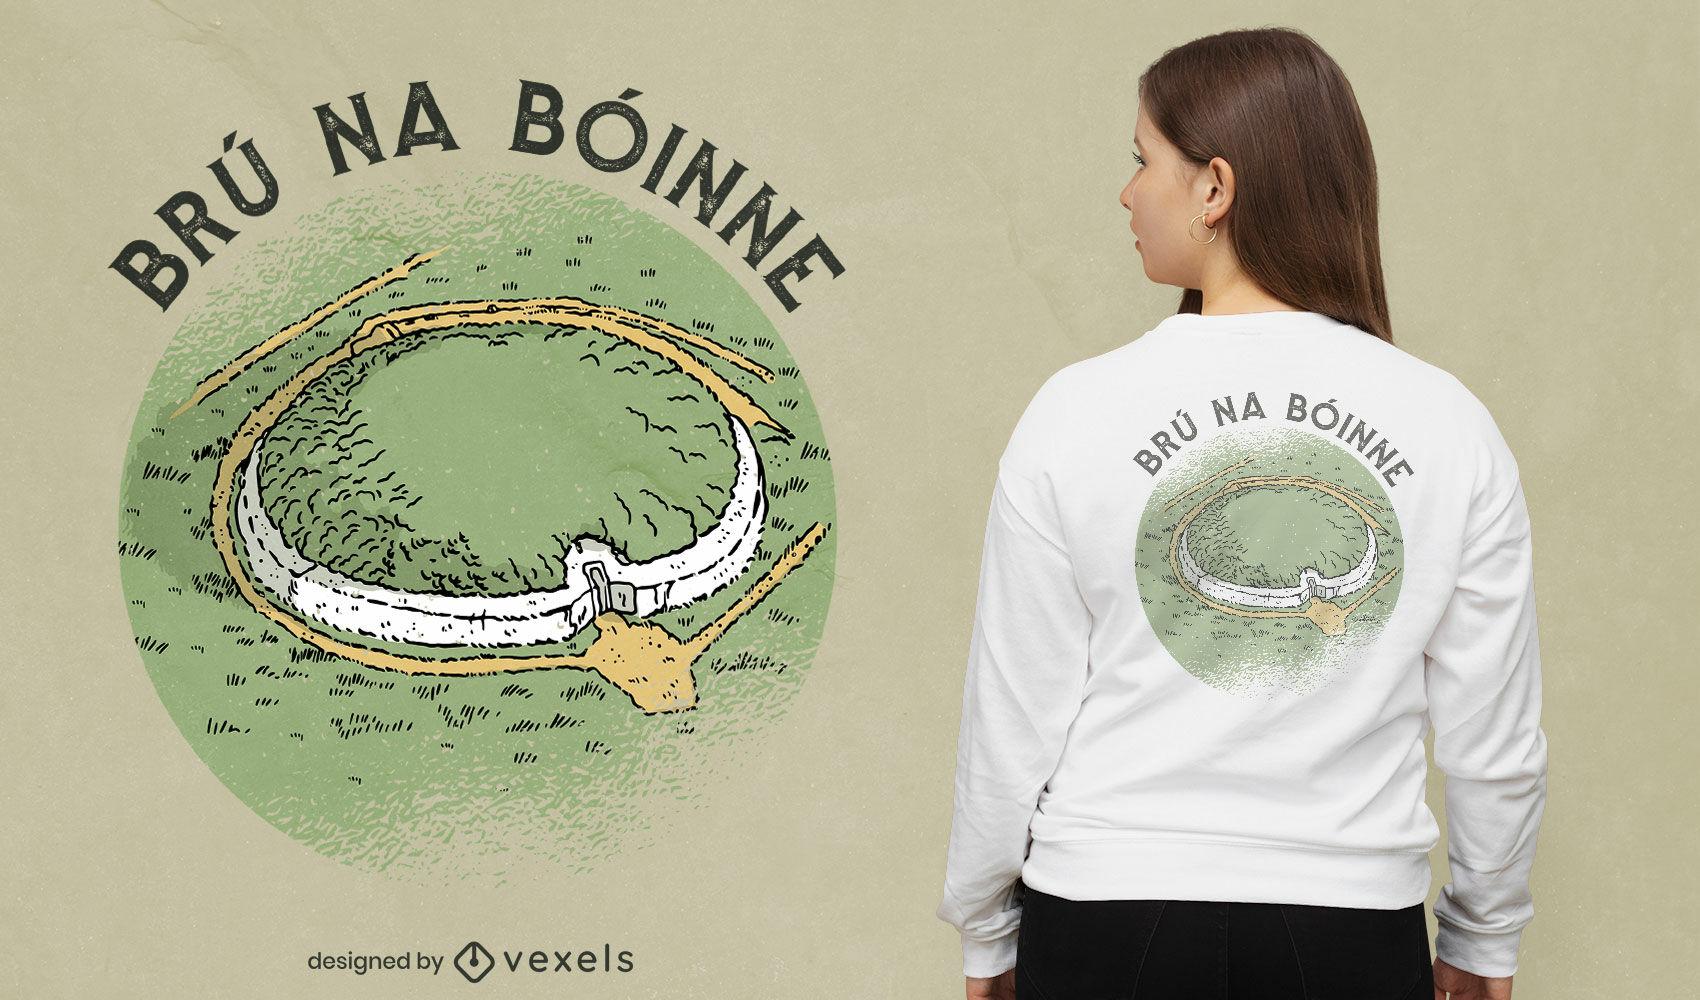 Dise?o de camiseta de Newgrange, emblem?tico irland?s